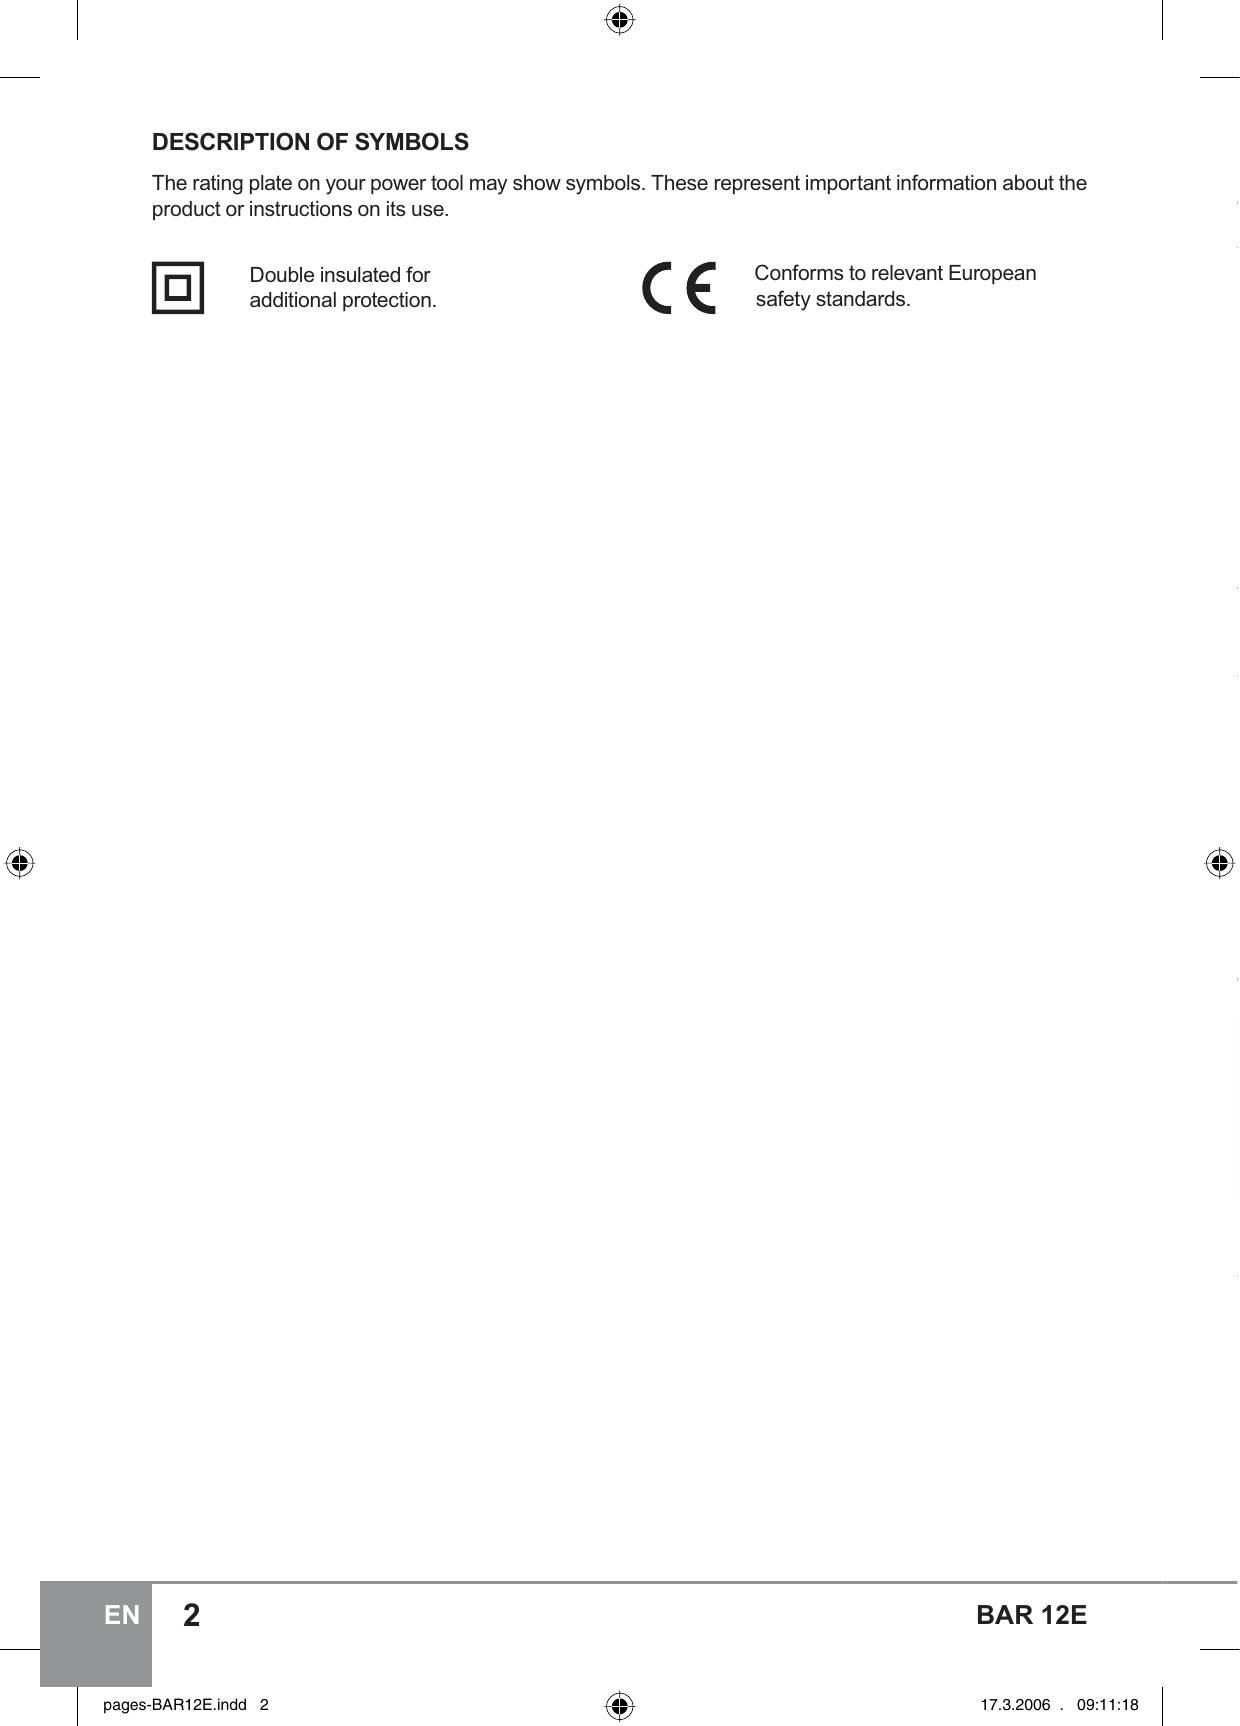 Sparky Group Bar 12E Users Manual BVR 6 Instrunction